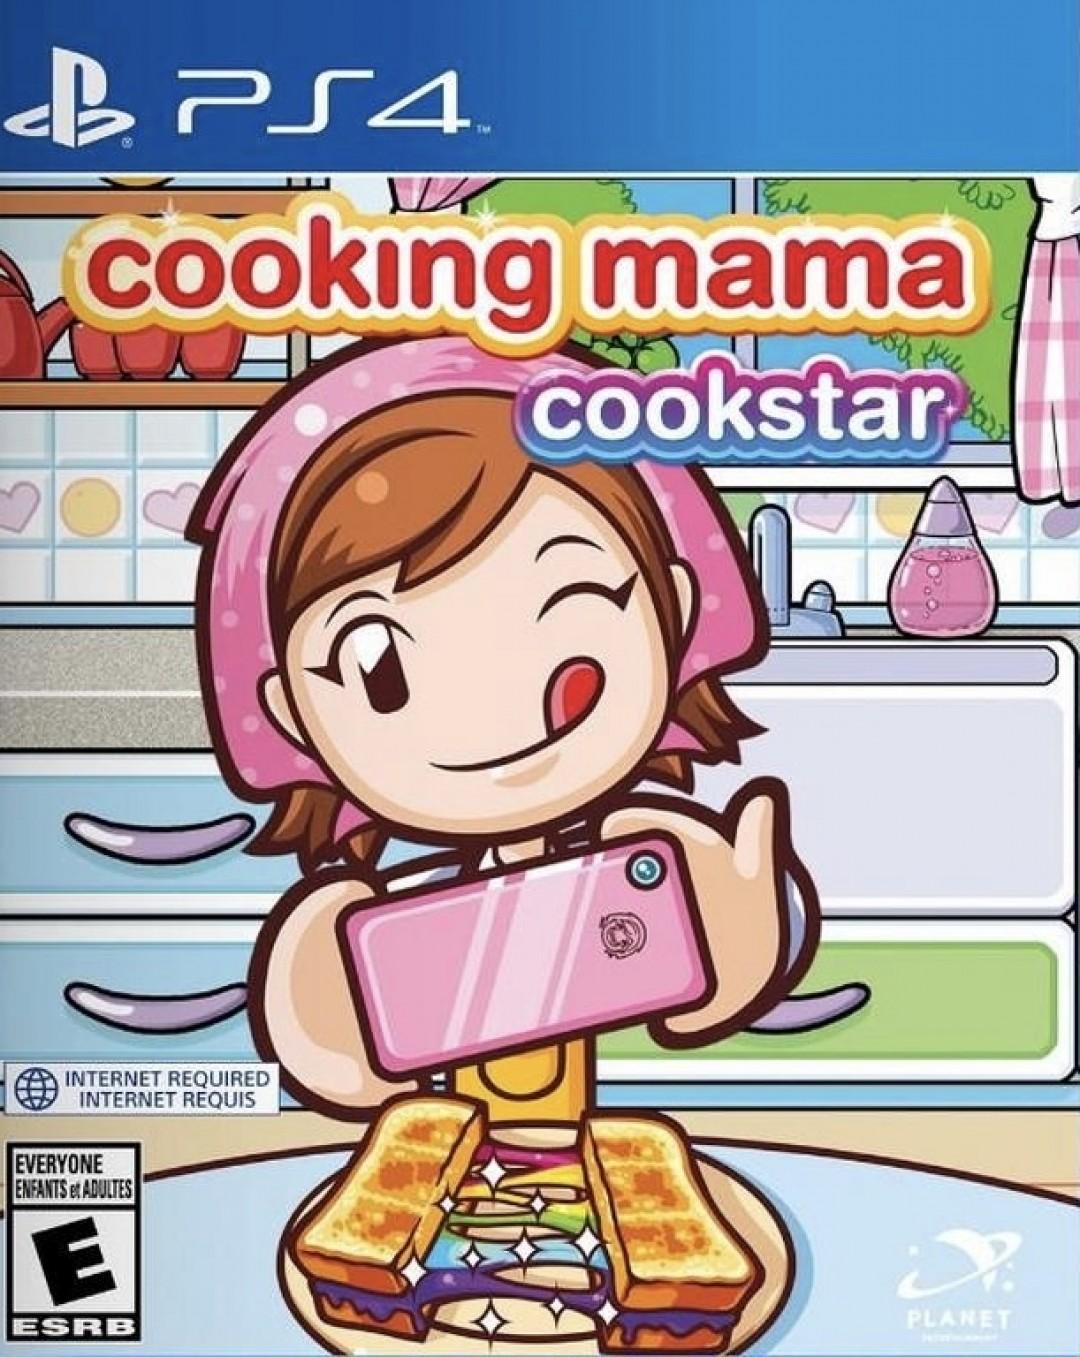 Cooking Mama Cookstar